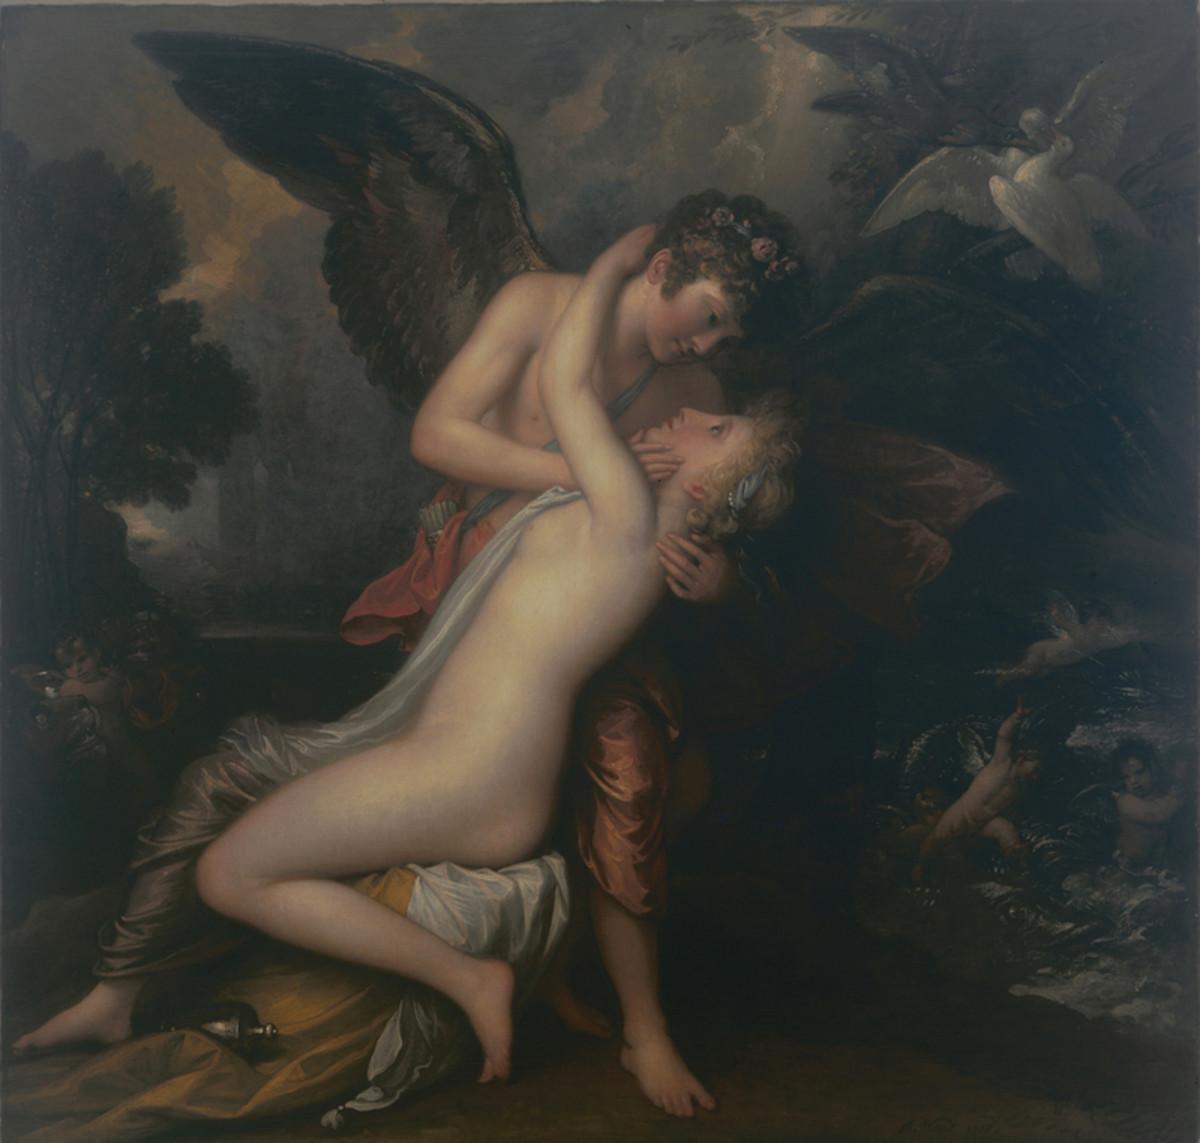 the-greek-mythology-of-psyche-and-eros